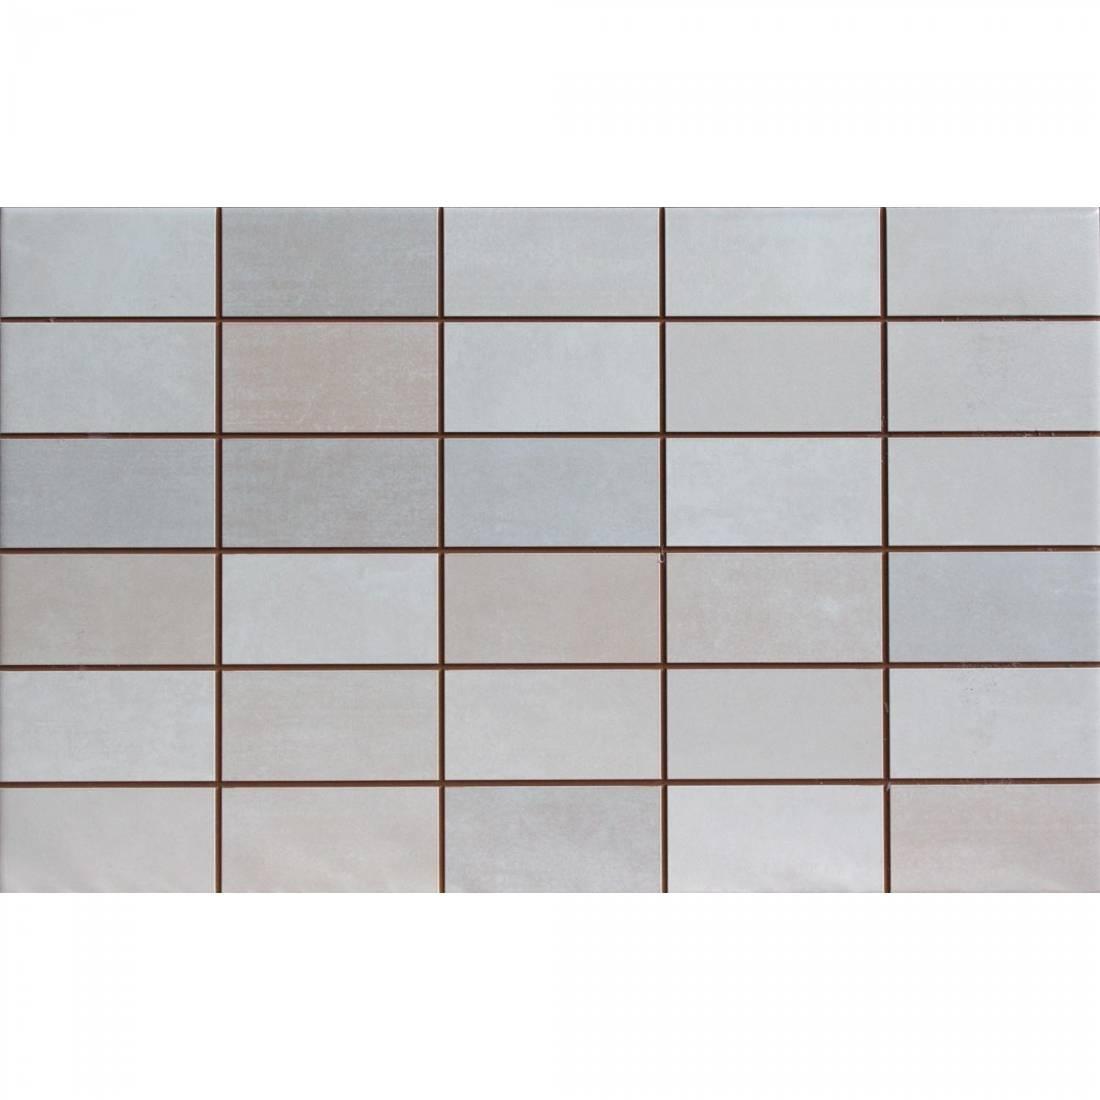 Cemento Decor 25x40 Grey Matt 1